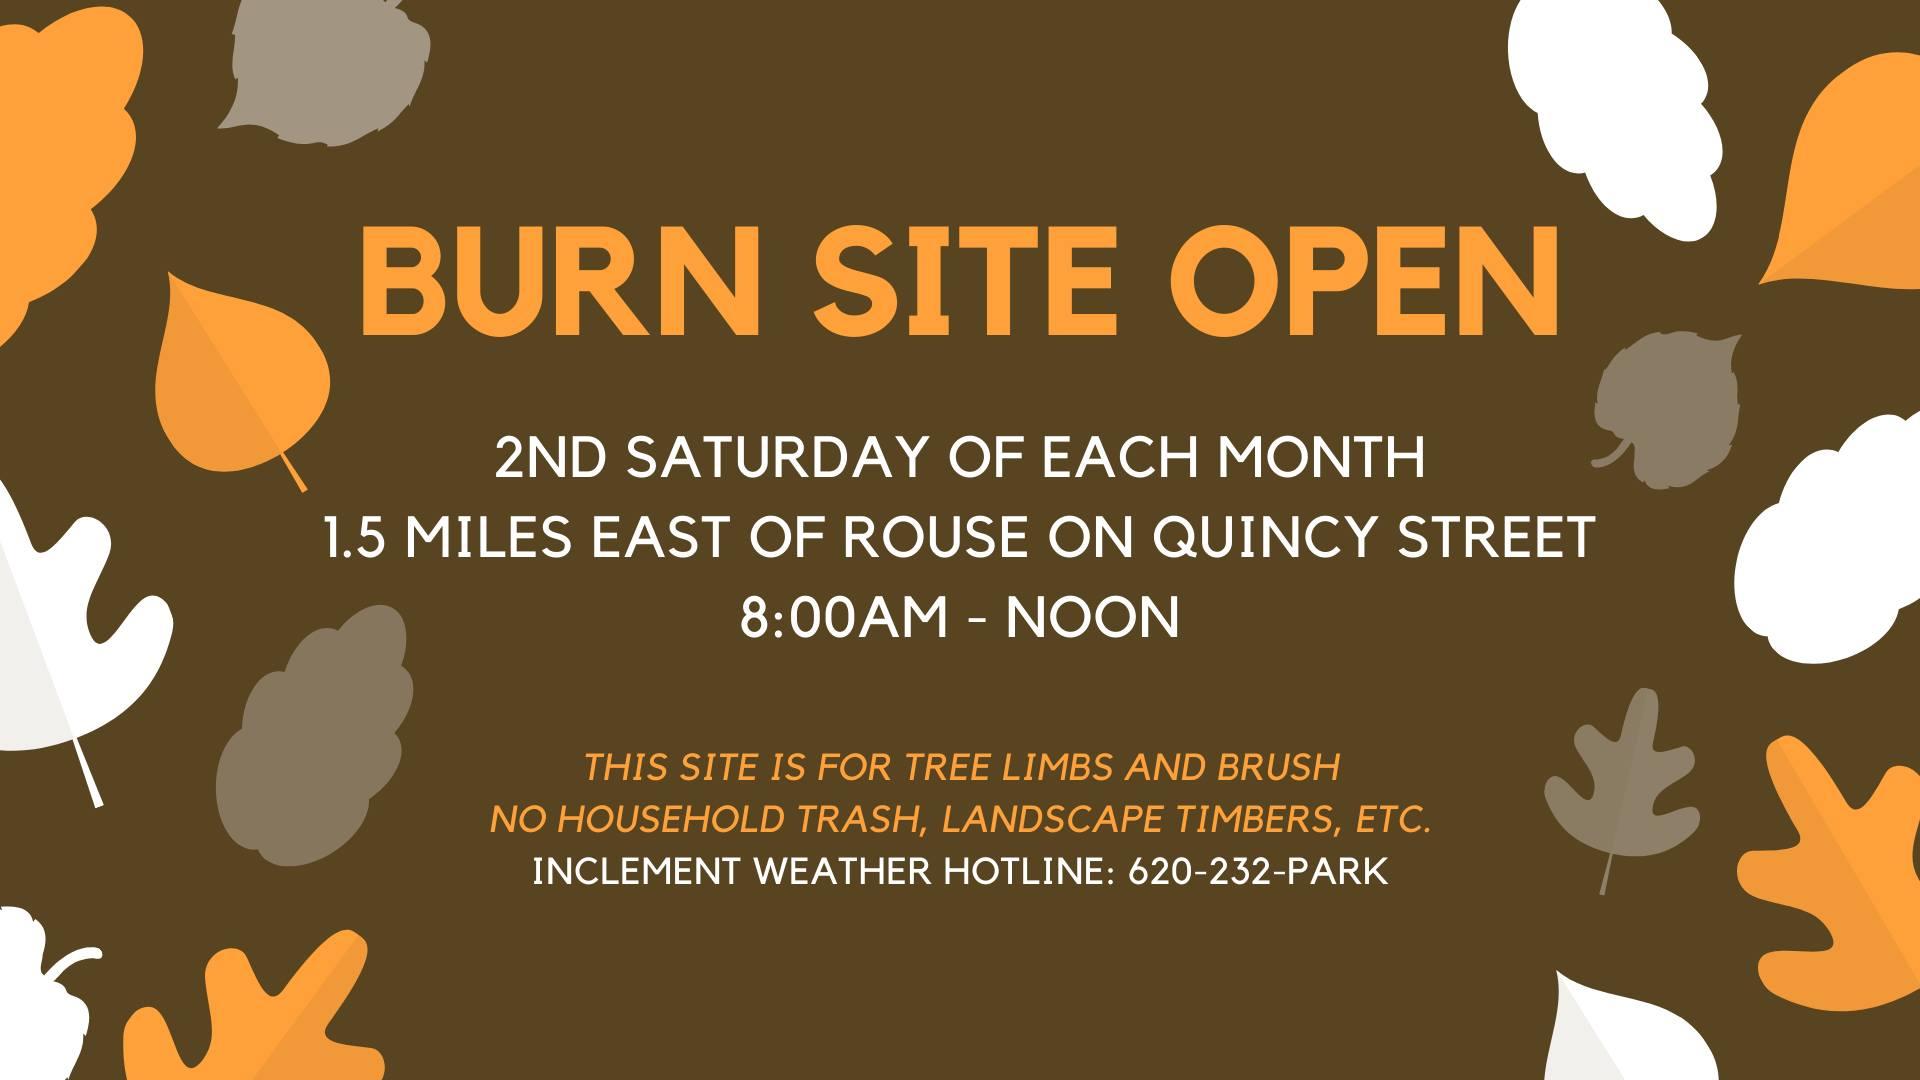 burn site image